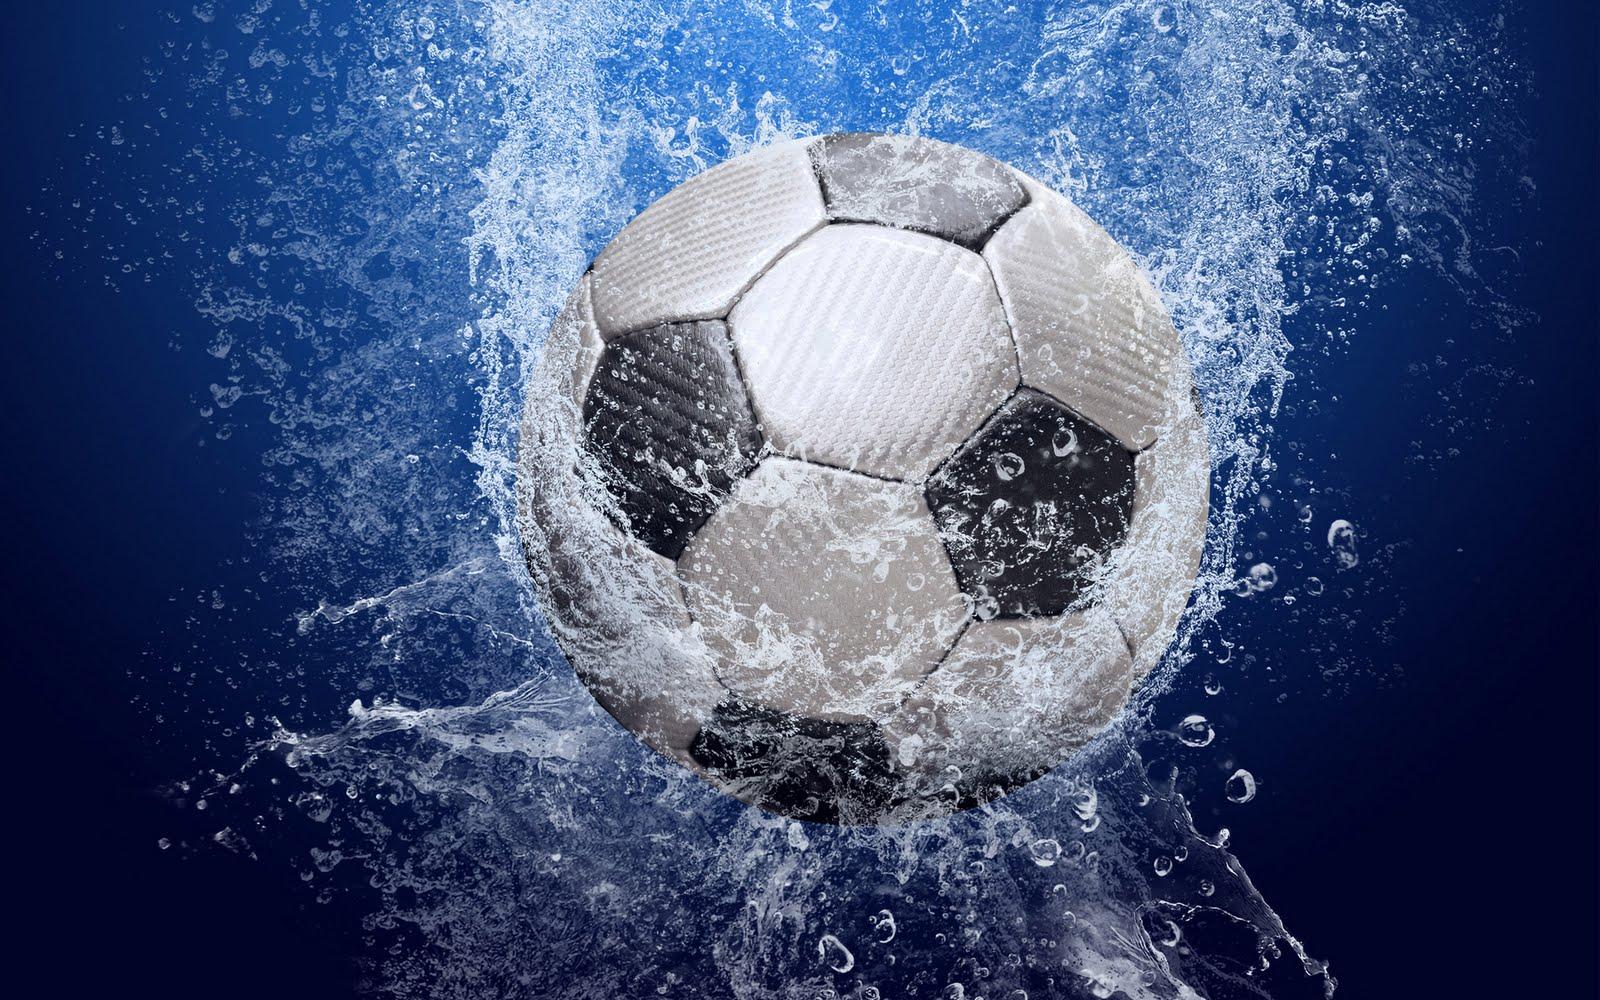 Football Walpaper: Dionne Beard: Football Wallpaper Hd